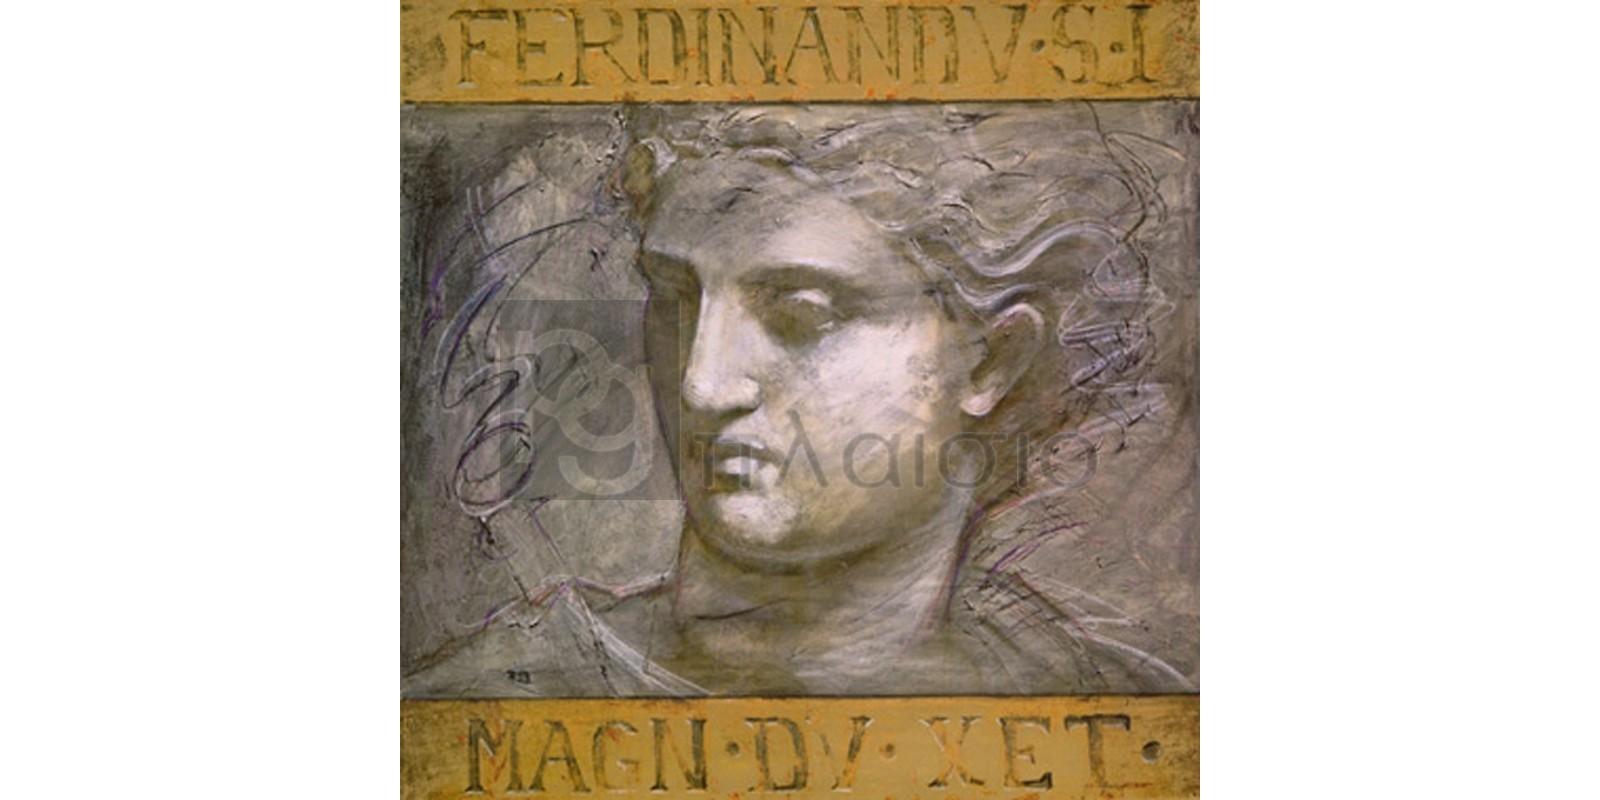 Franklin Richard - Ferdinand